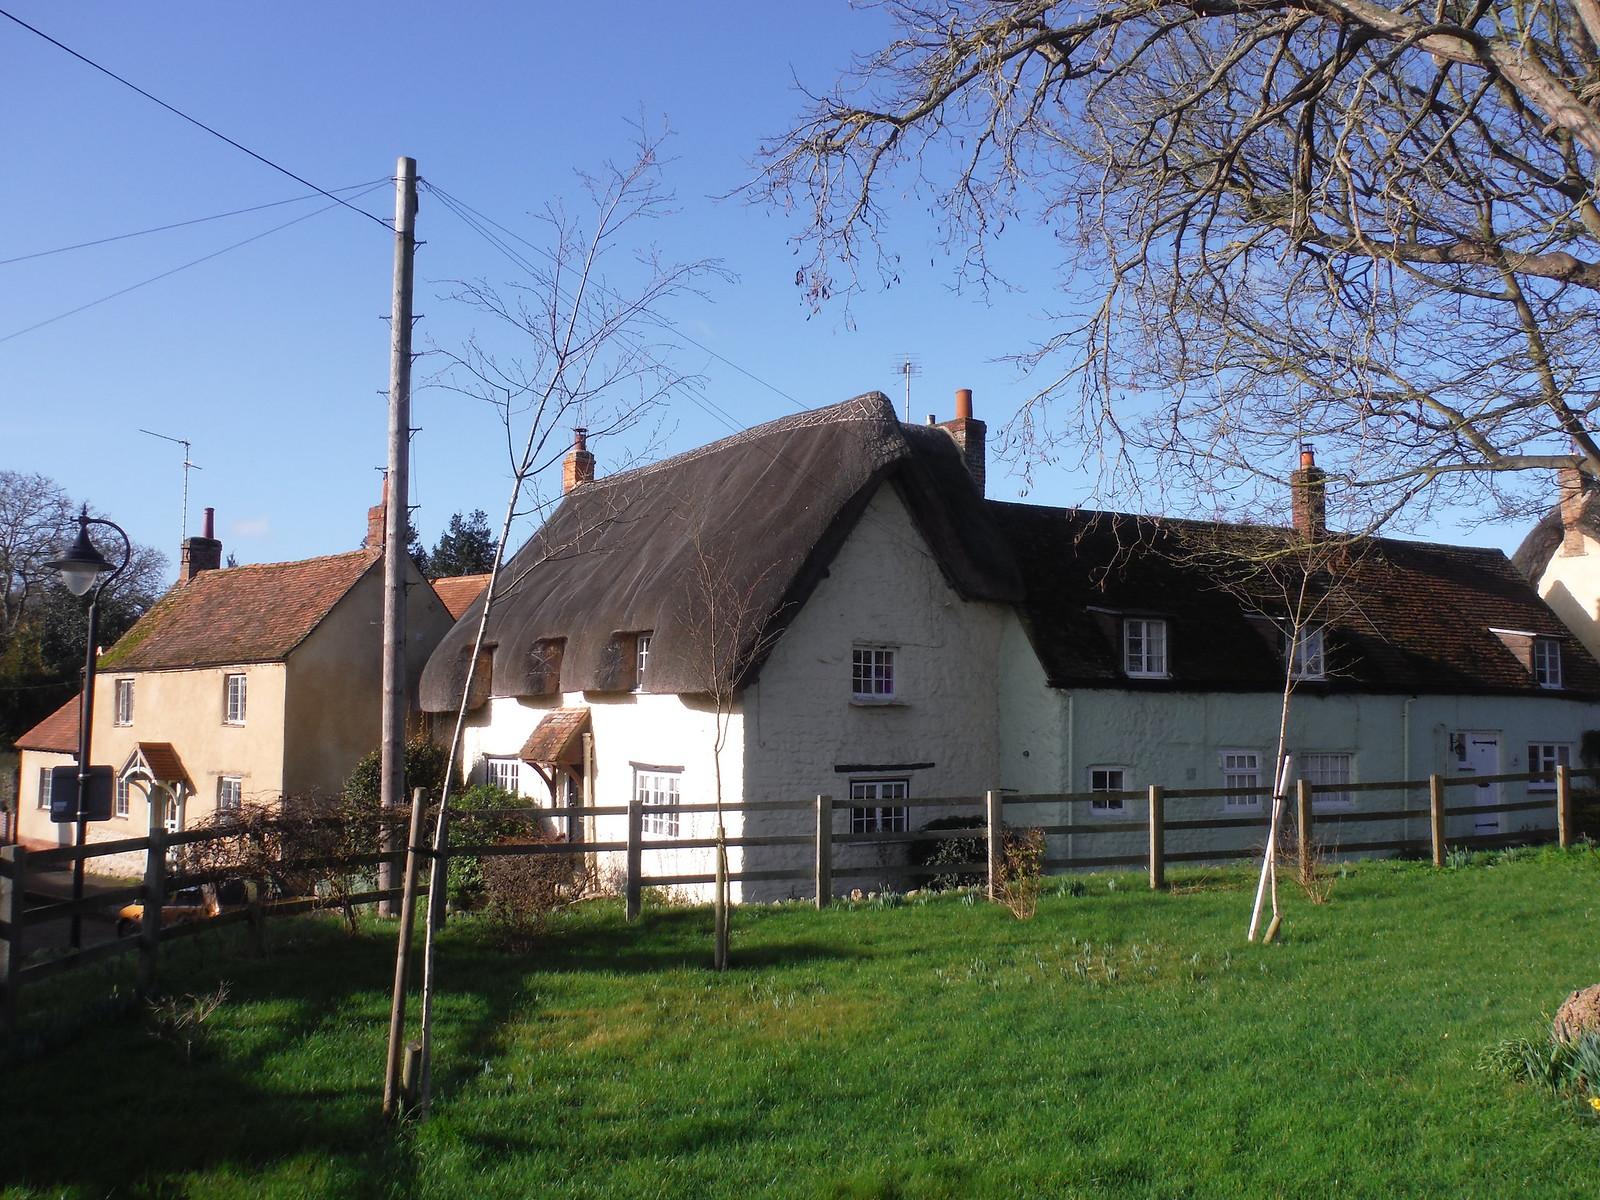 House in Long Crendon SWC Walk 191 Haddenham Circular (via Brill)